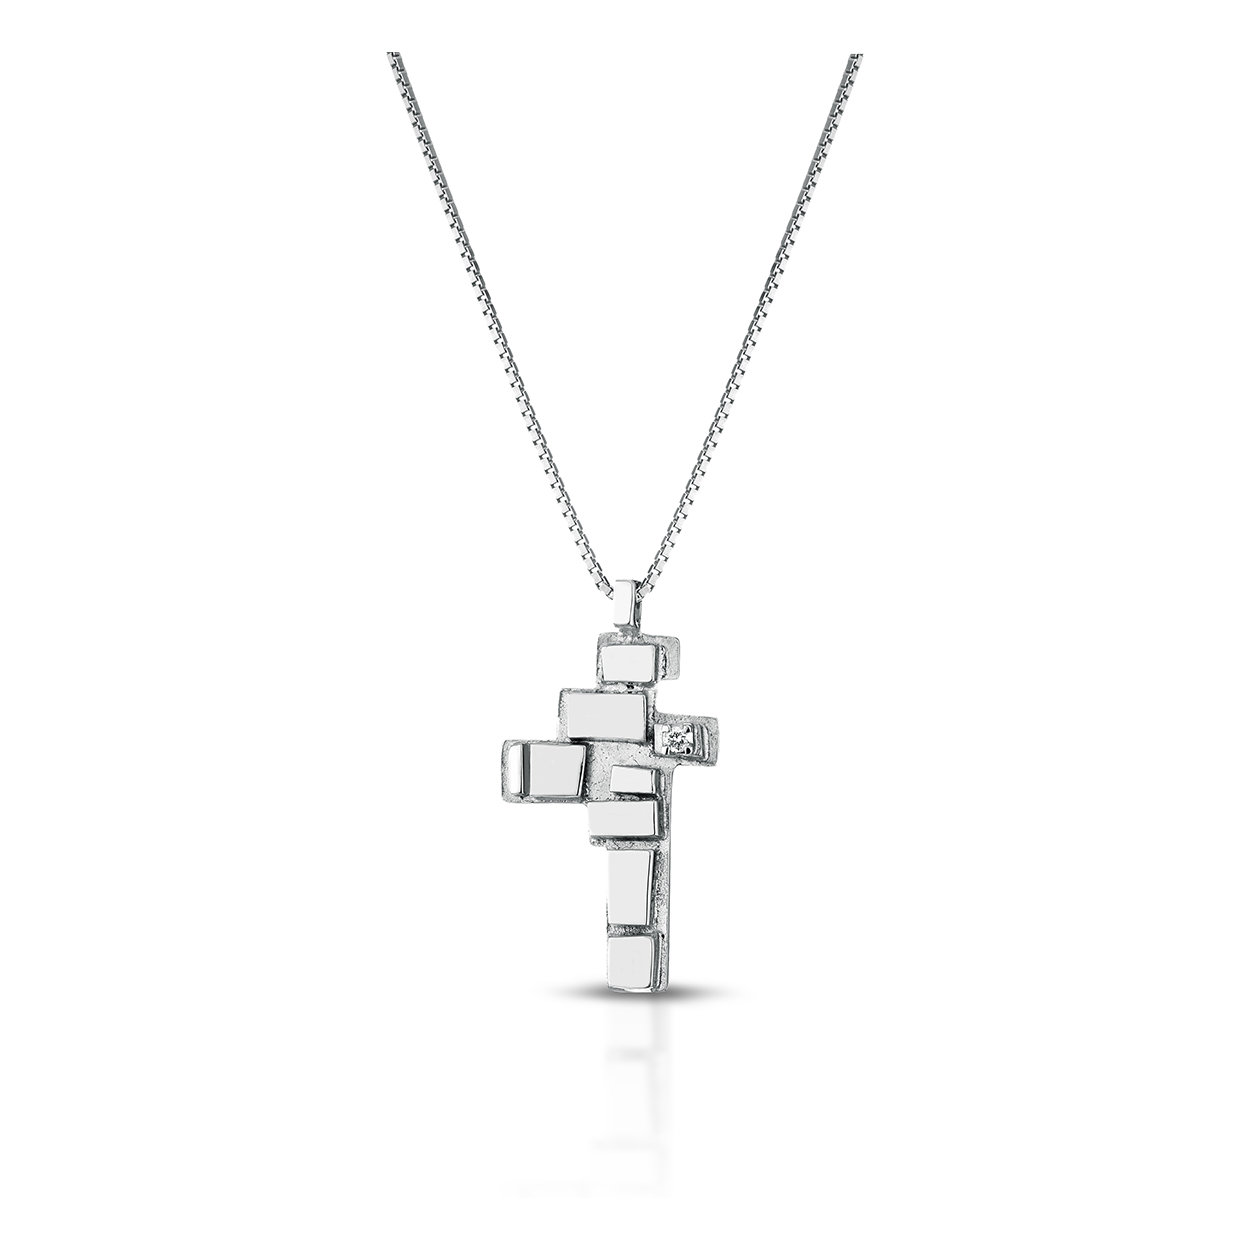 Pendente linea Segno in argento e 1 diamante naturale con giro gola in argento